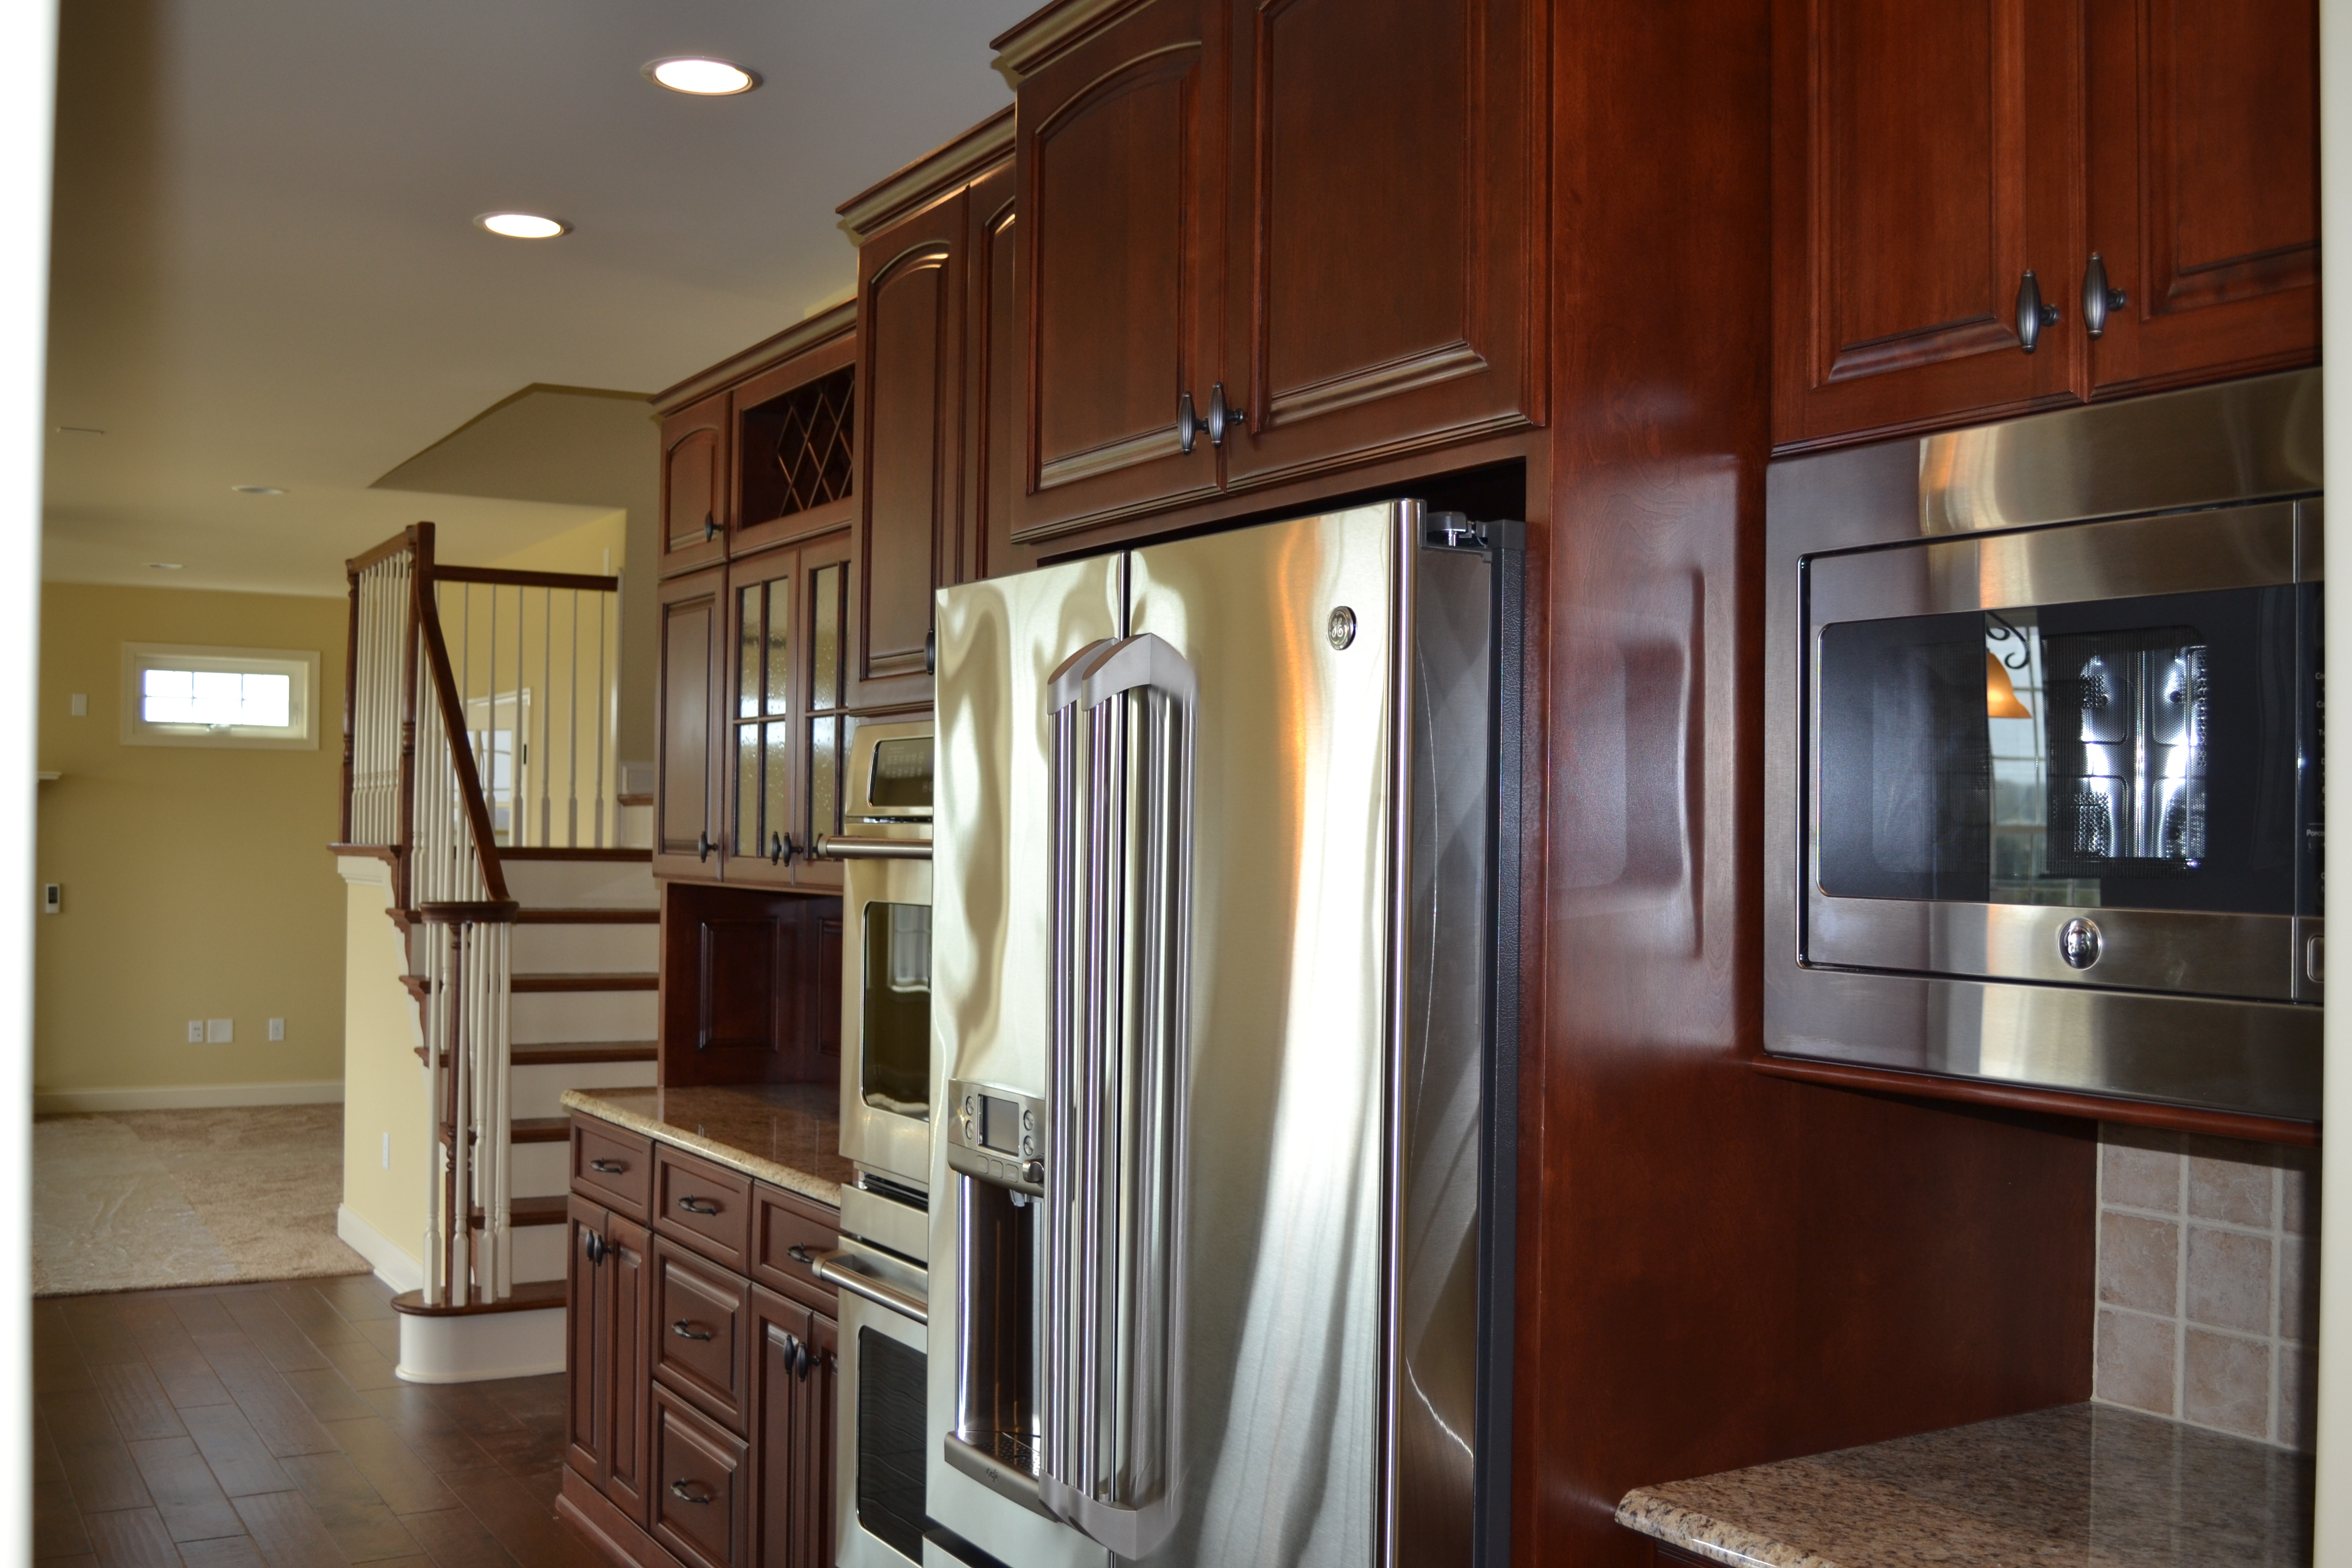 jlh inc custom home 3 kitchen remodeling york pa Custom kitchen in home built by Jeffrey L Henry Inc of York